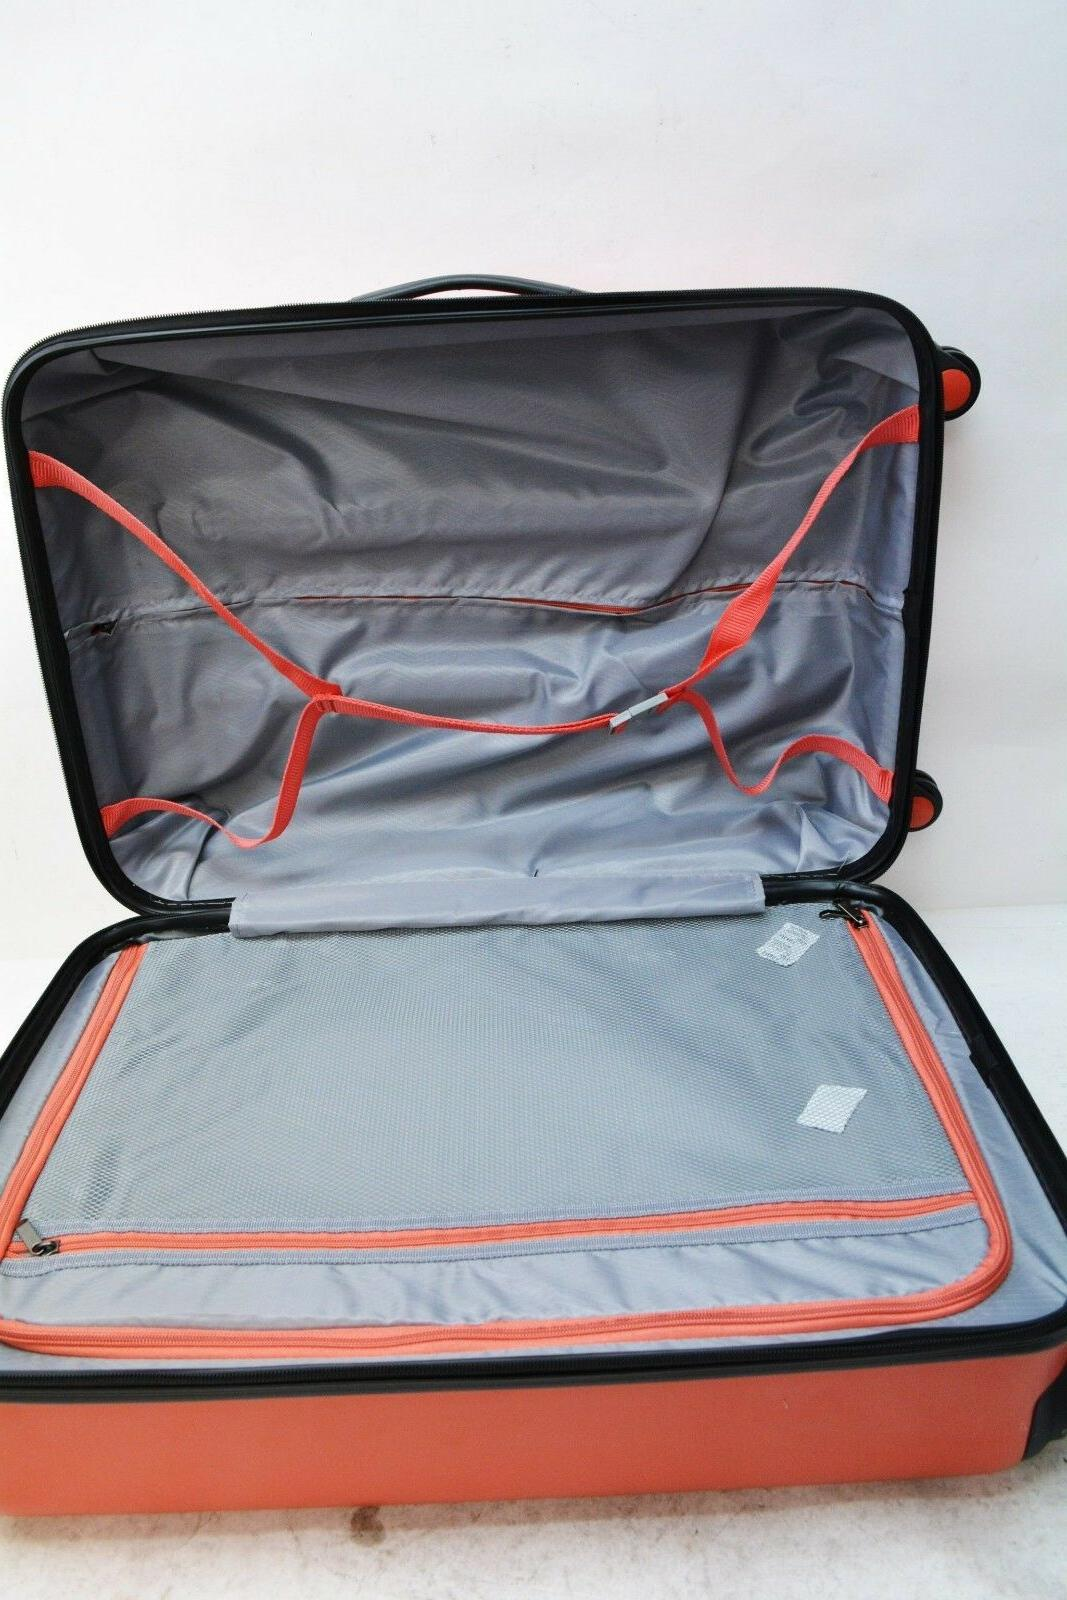 "$360 NEW Savannah 24"" Luggage Suitcase Bag"